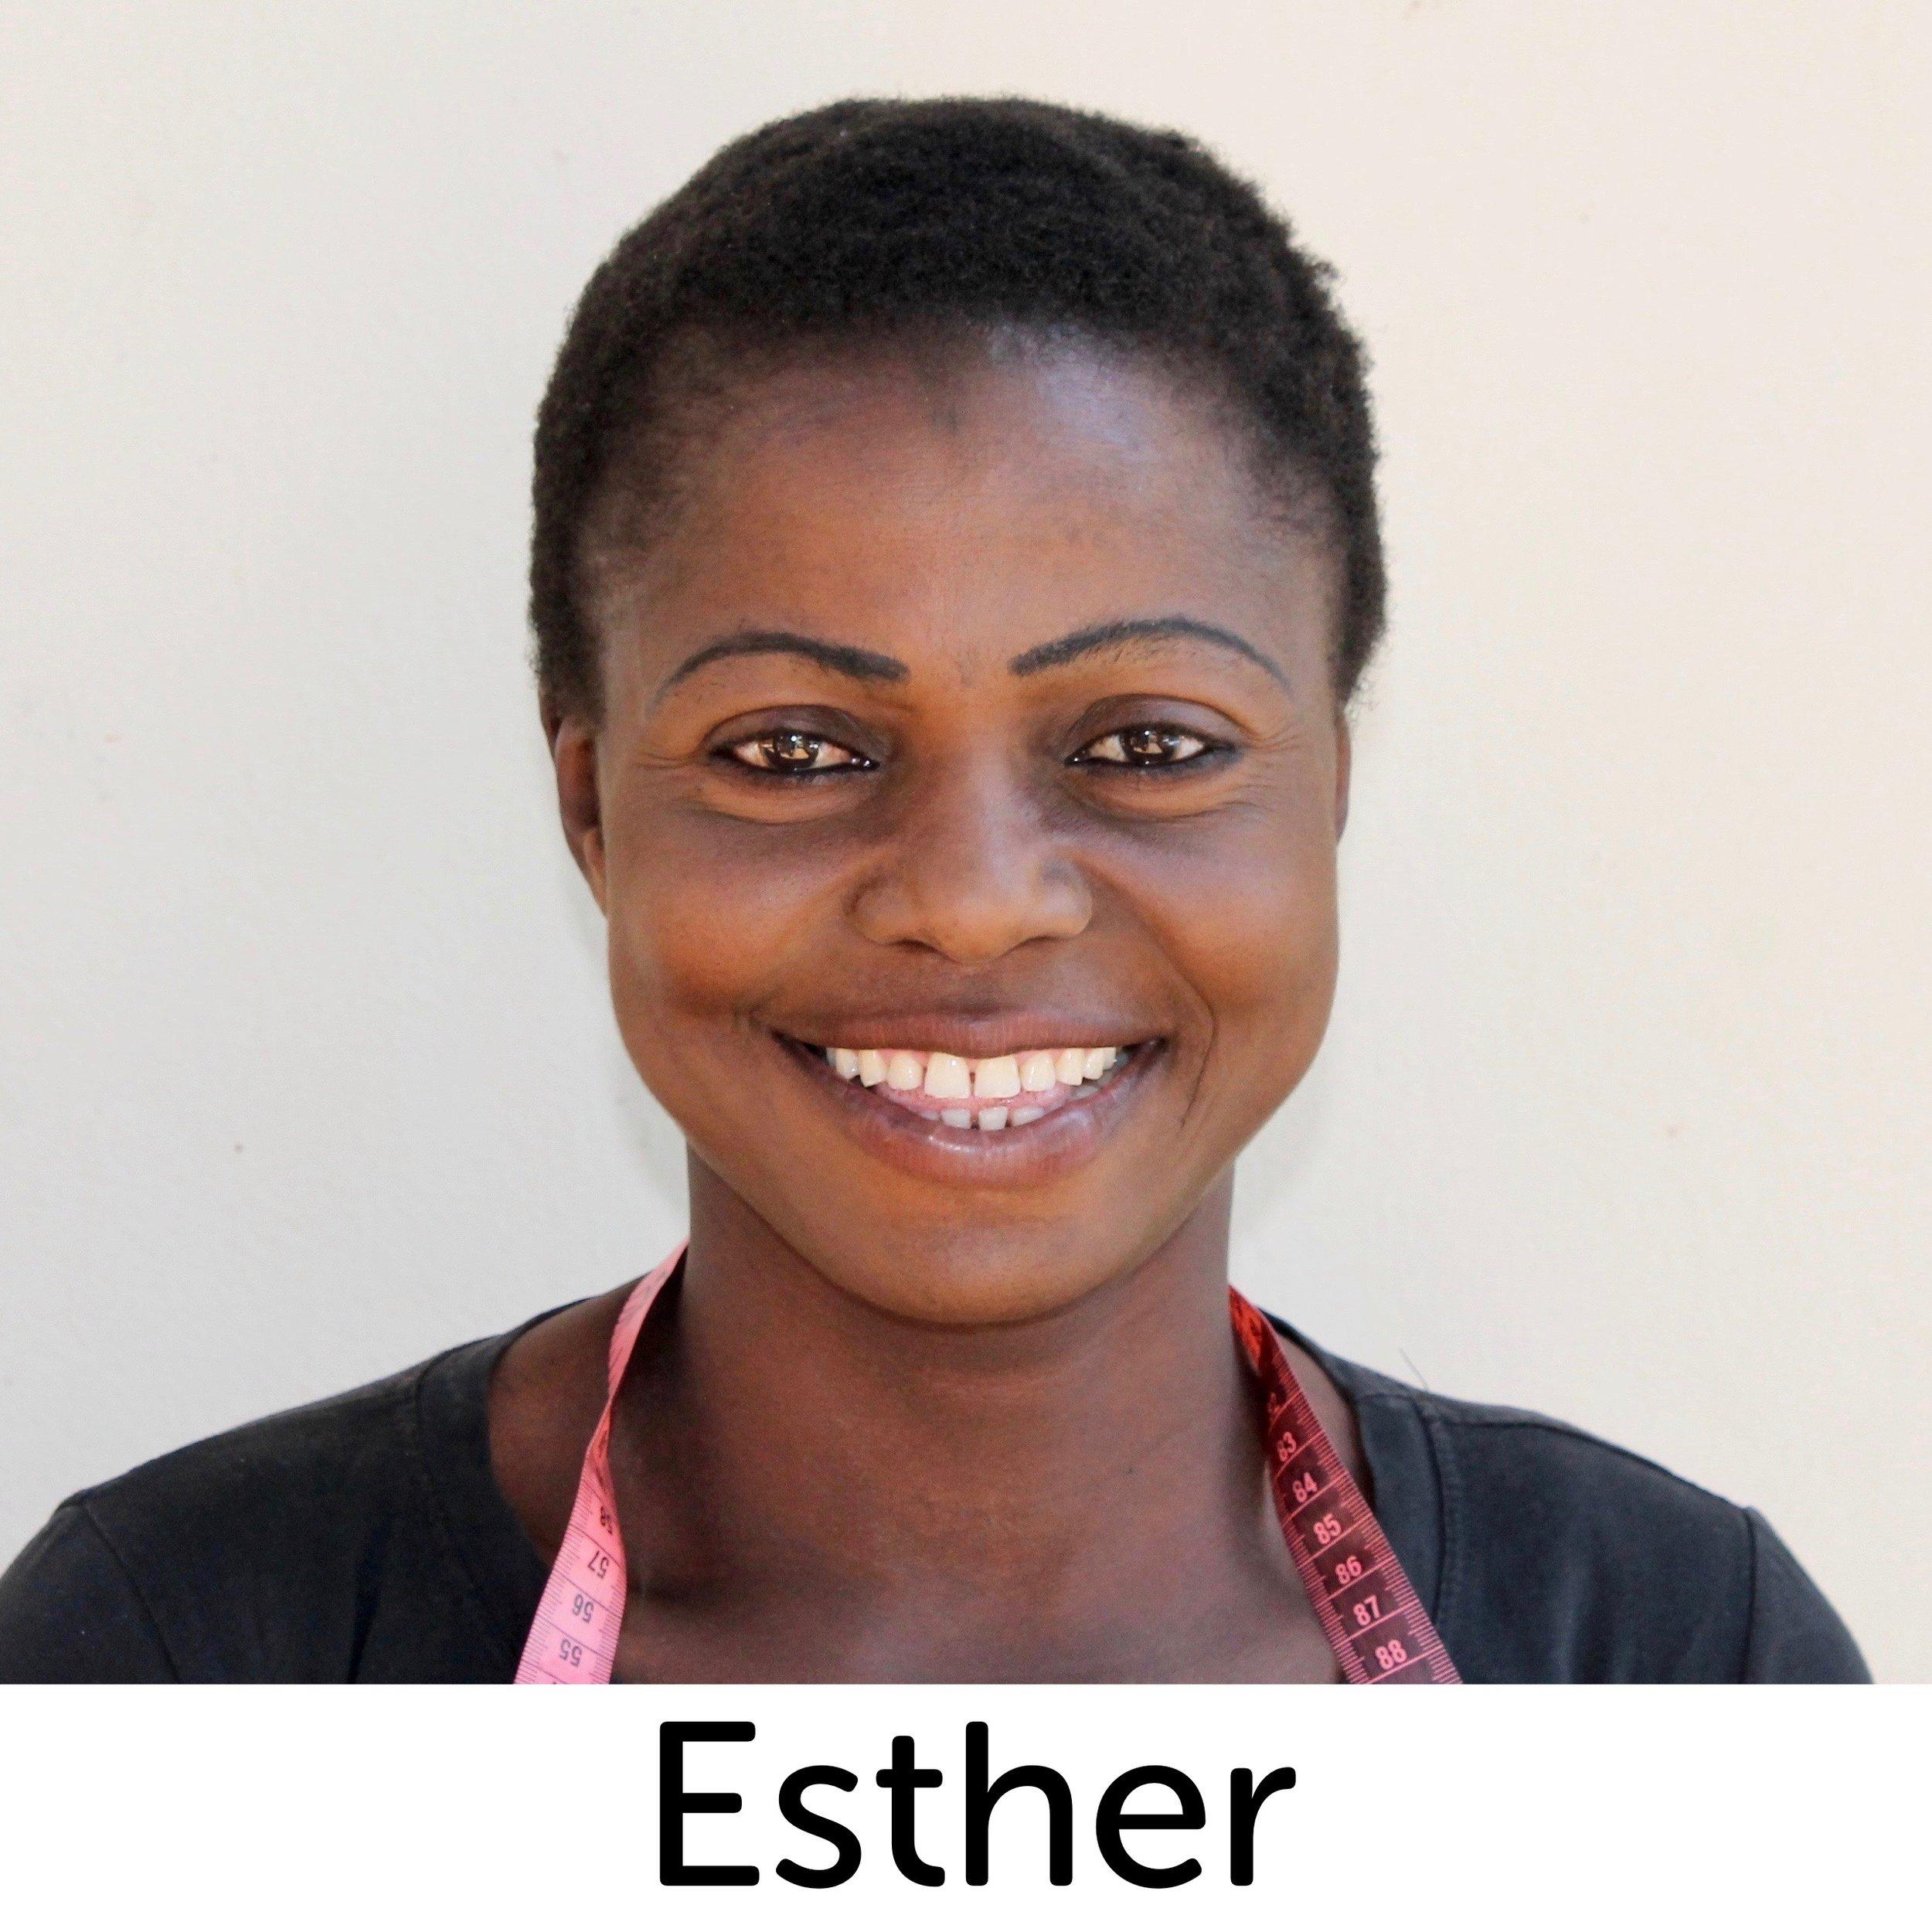 HOM Esther 2.jpg